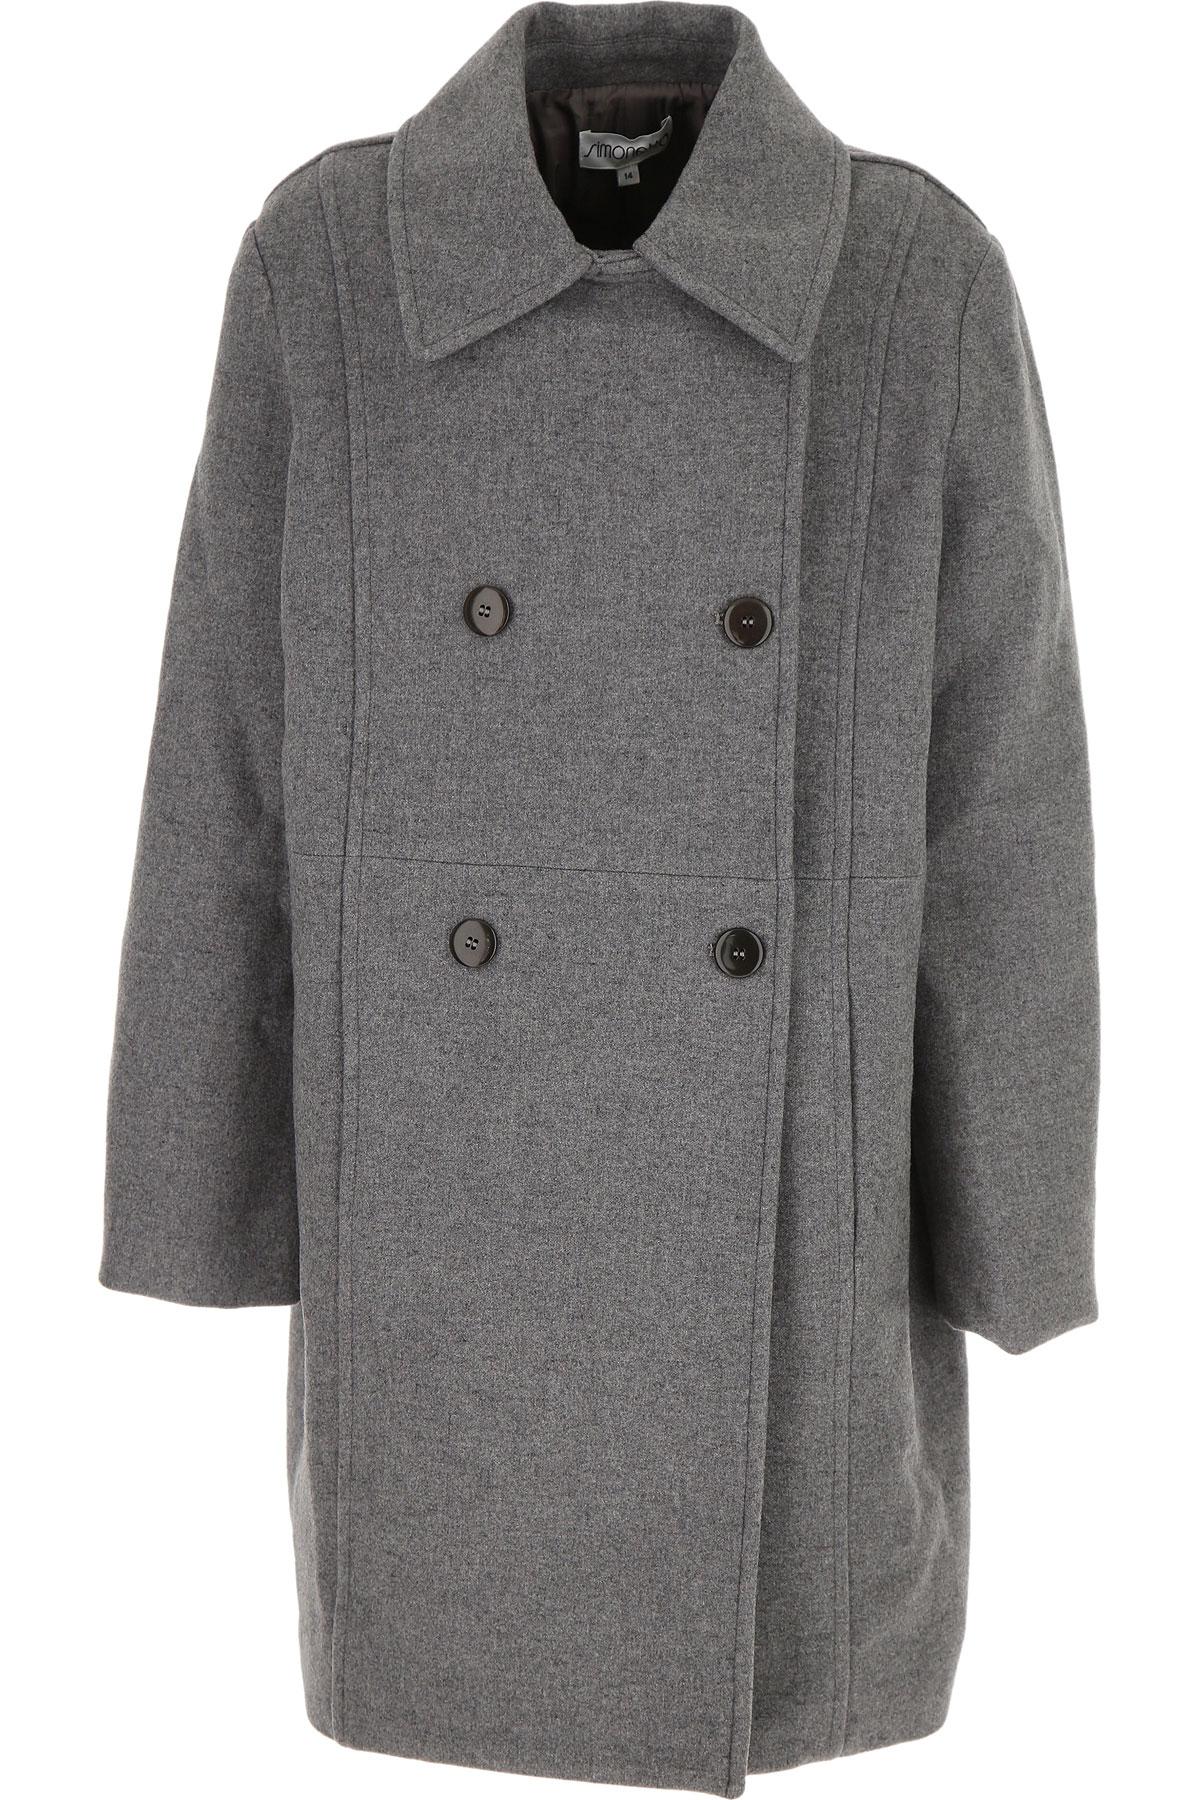 Simonetta {DESIGNER} Kids Coat for Girls On Sale, Grey, Virgin wool, 2019, 14Y 16Y